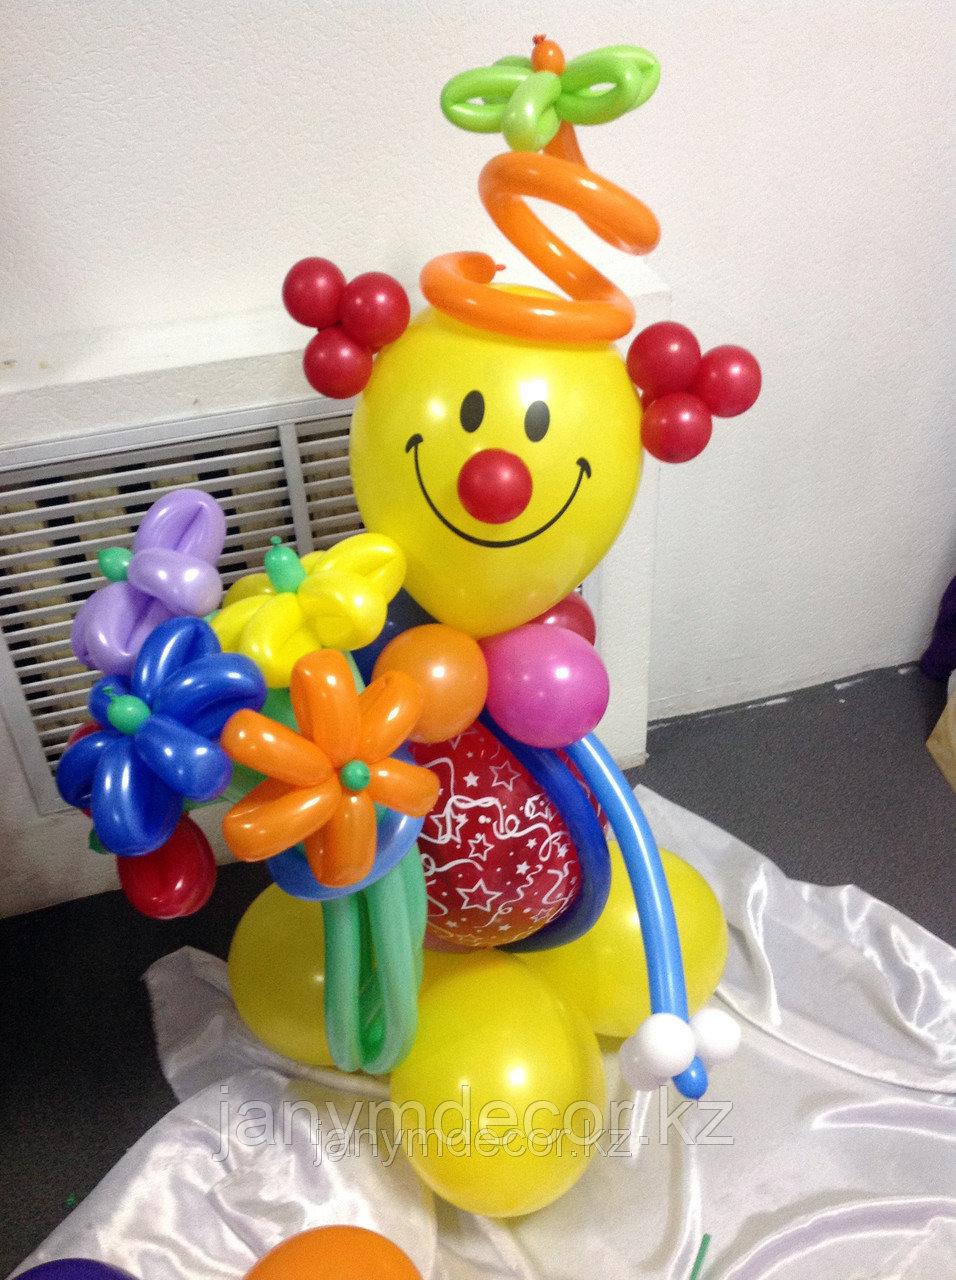 Клоун с букетом к 8 марта - фото 2